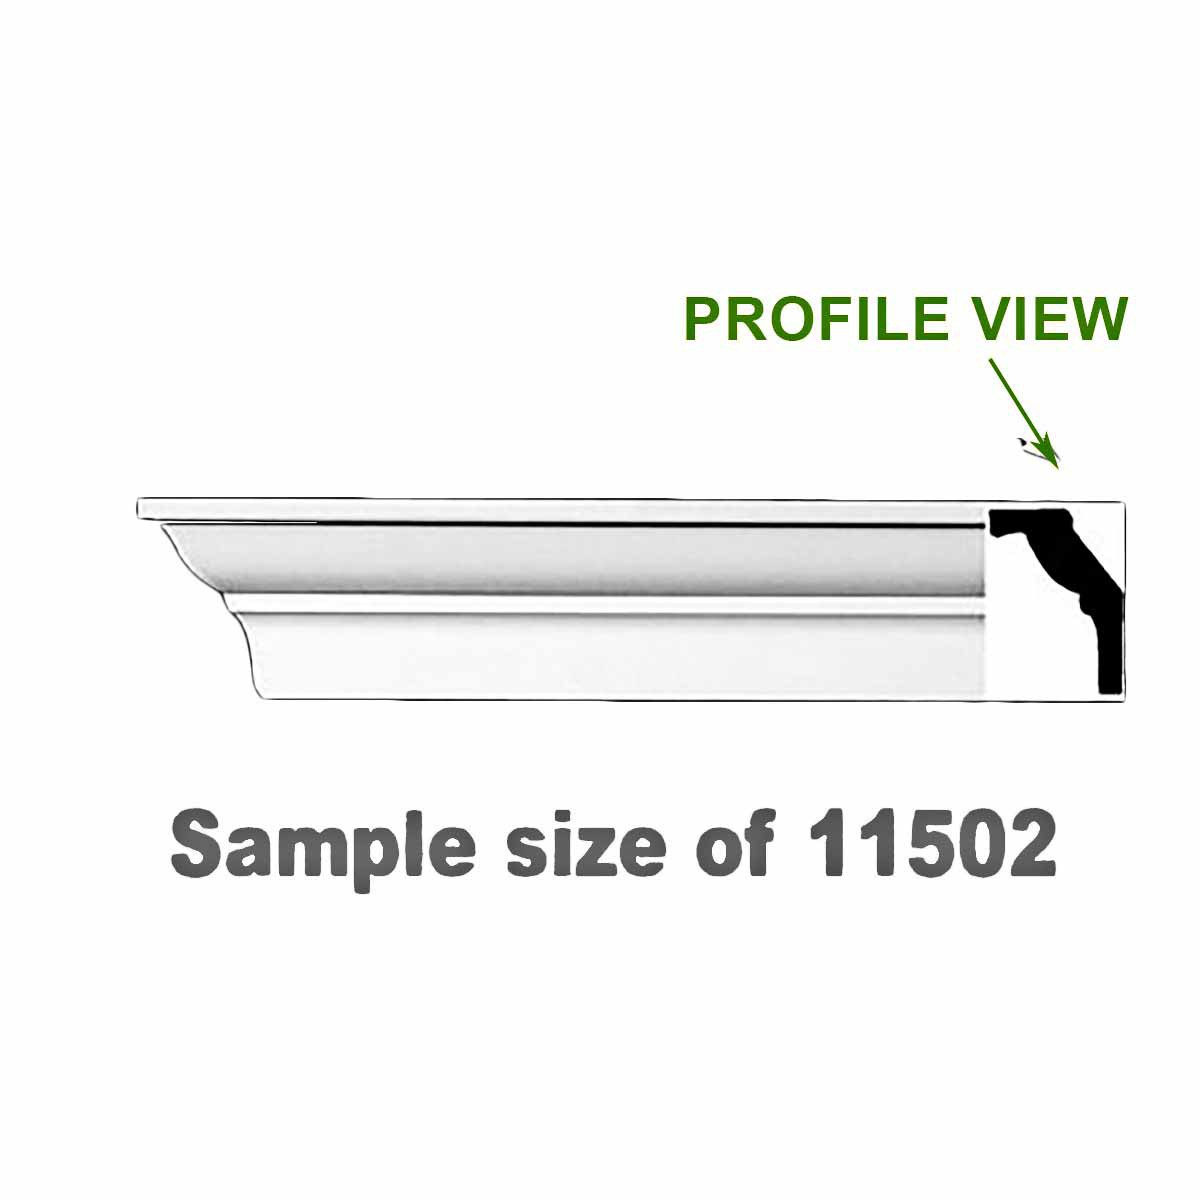 "Cornice White Urethane 23.5"" Sample of 11502 | Renovator's Supply"